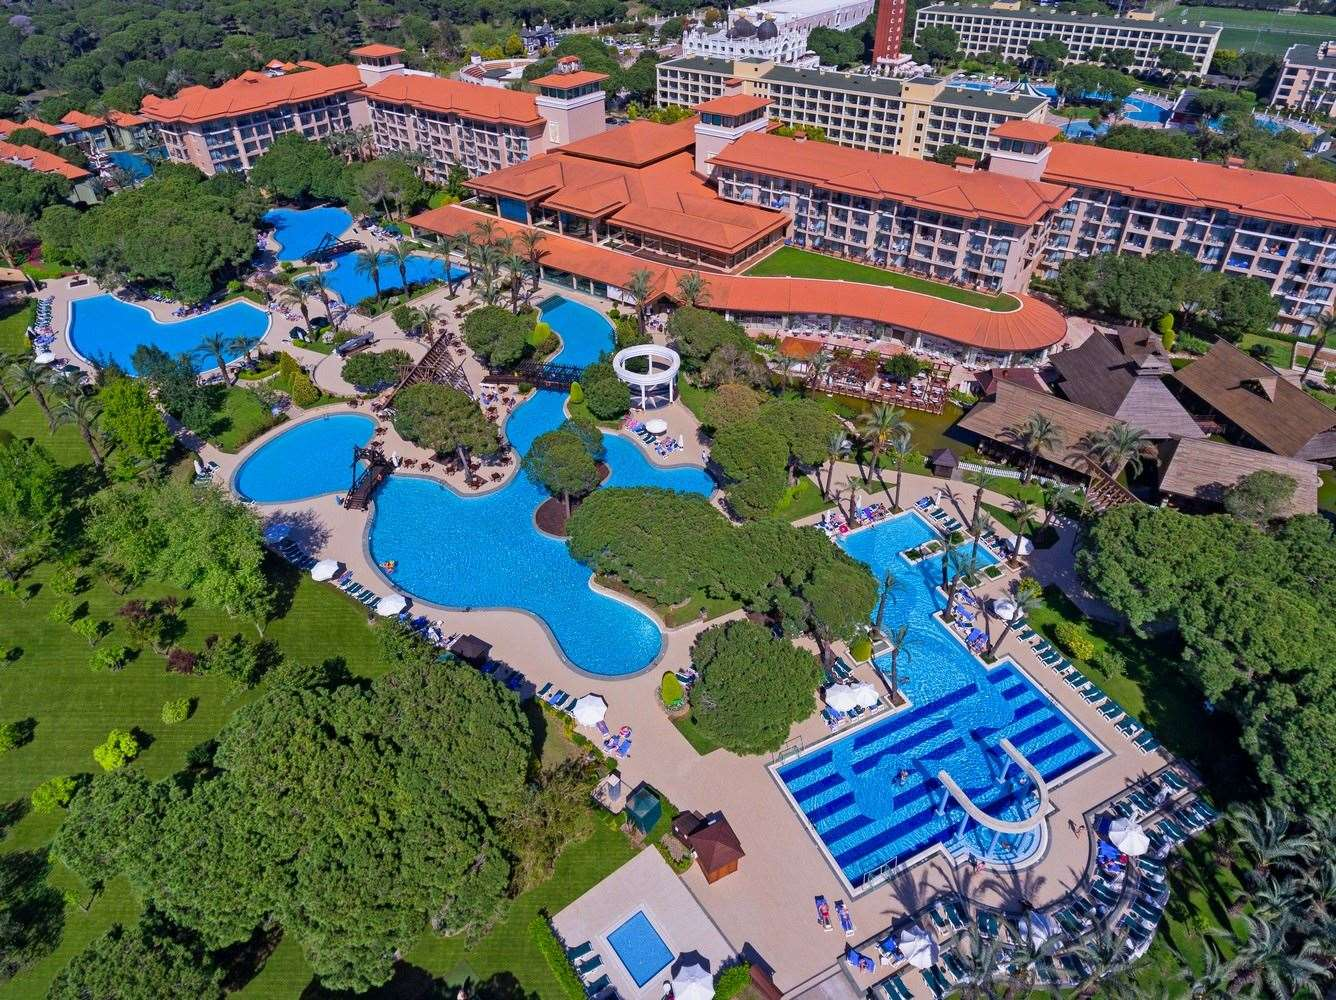 Отель Ic Hotels Green Palace, Анталия, Турция